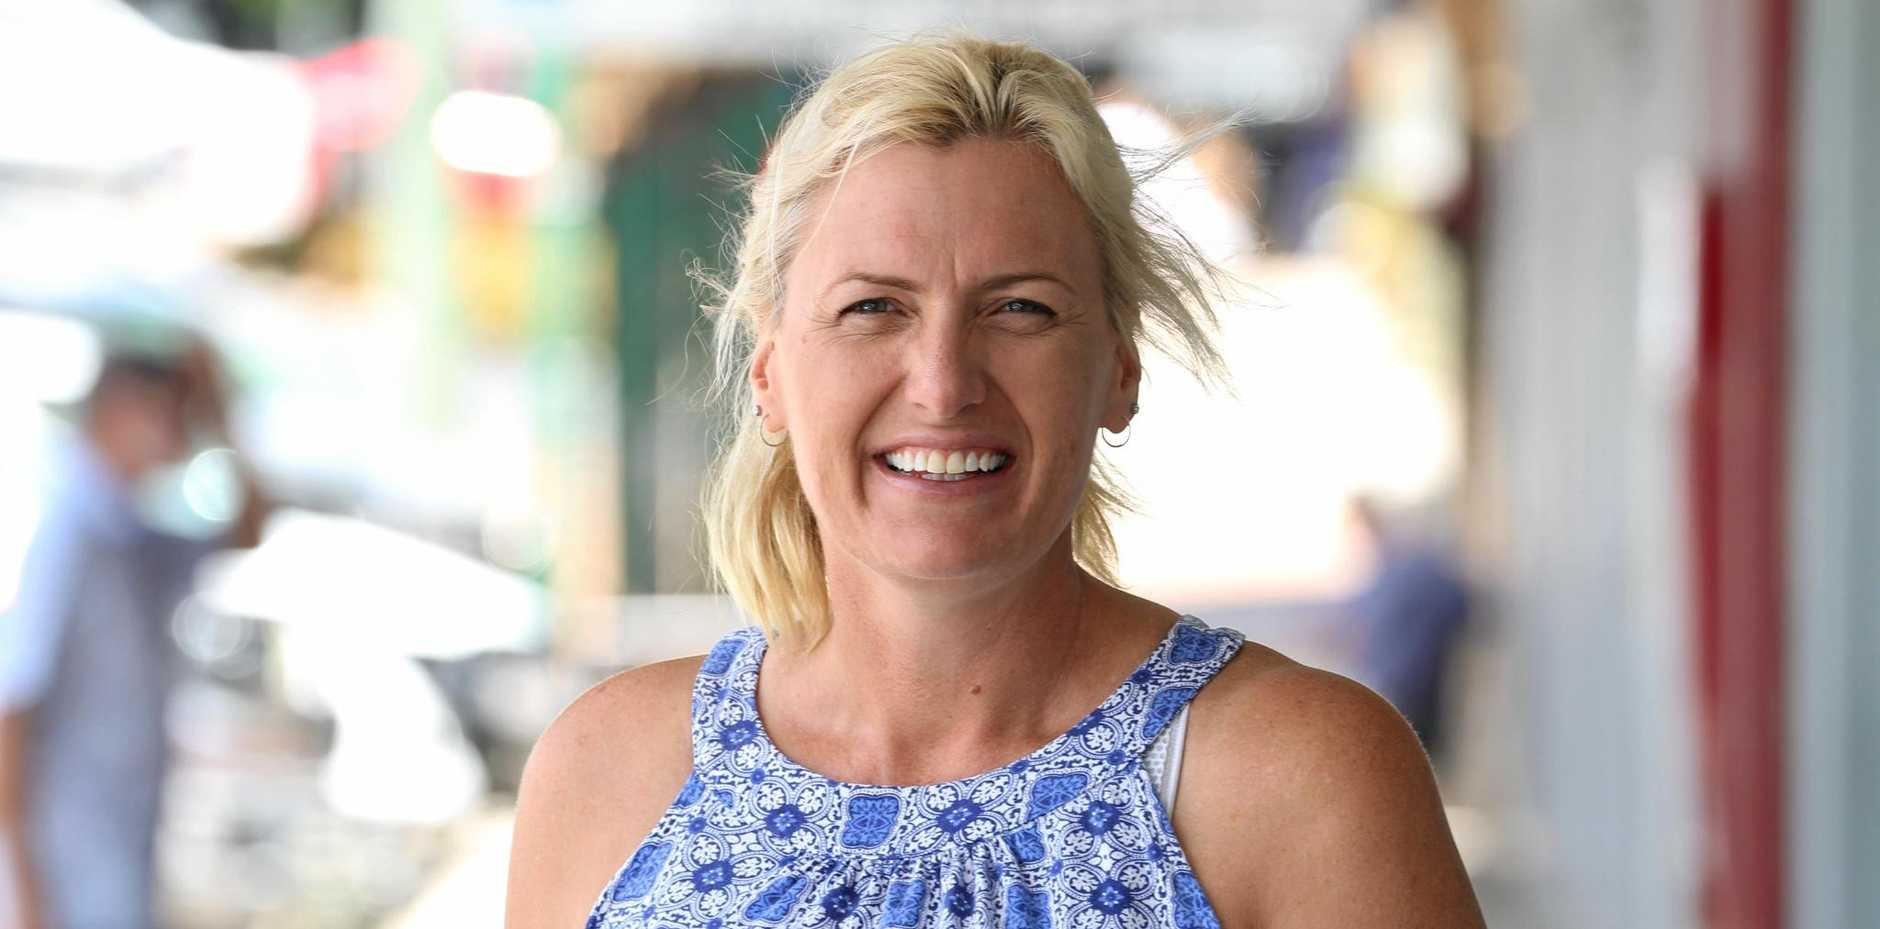 Kirsten Ellis is gearing up for the Stanthorpe Australia Day Triathlon.